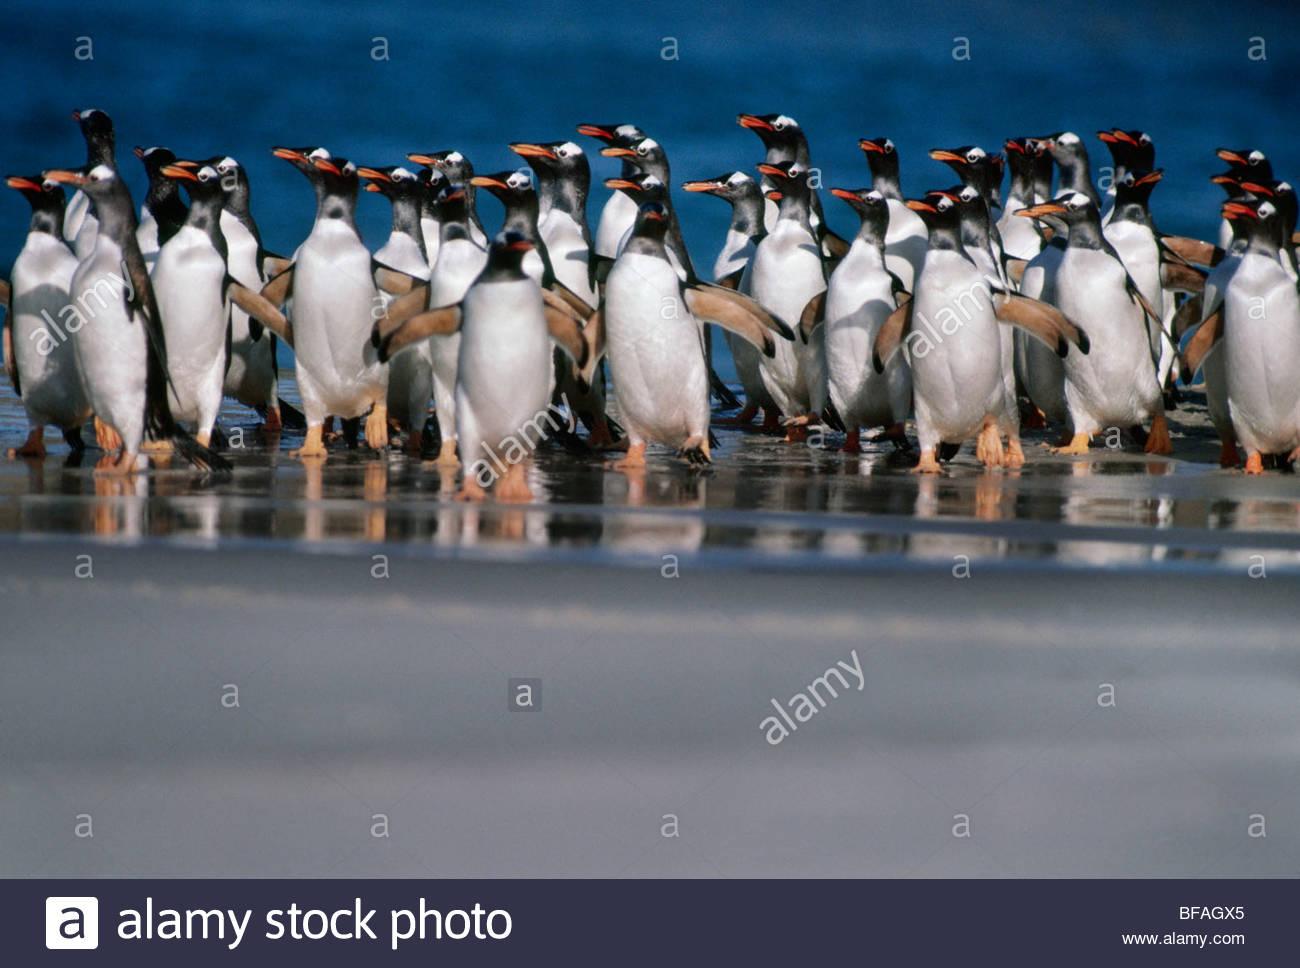 Gentoo penguins coming ashore, Pygoscelis papua, Falkland Islands - Stock Image